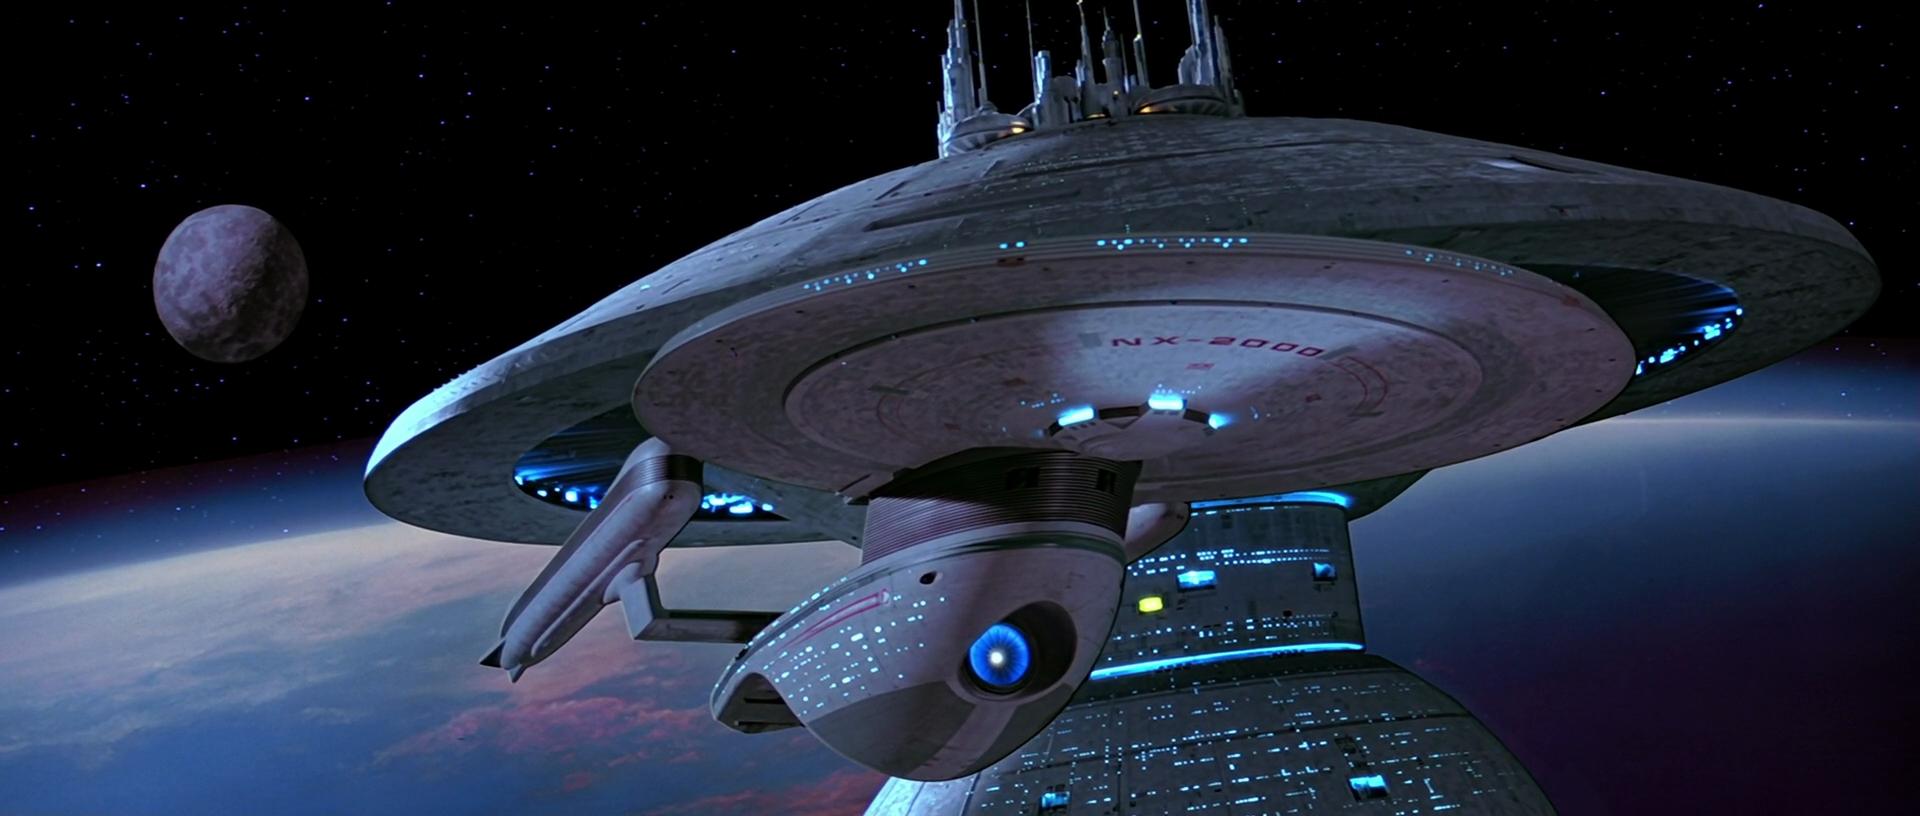 Uss Excelsior Memory Alpha The Star Trek Wiki